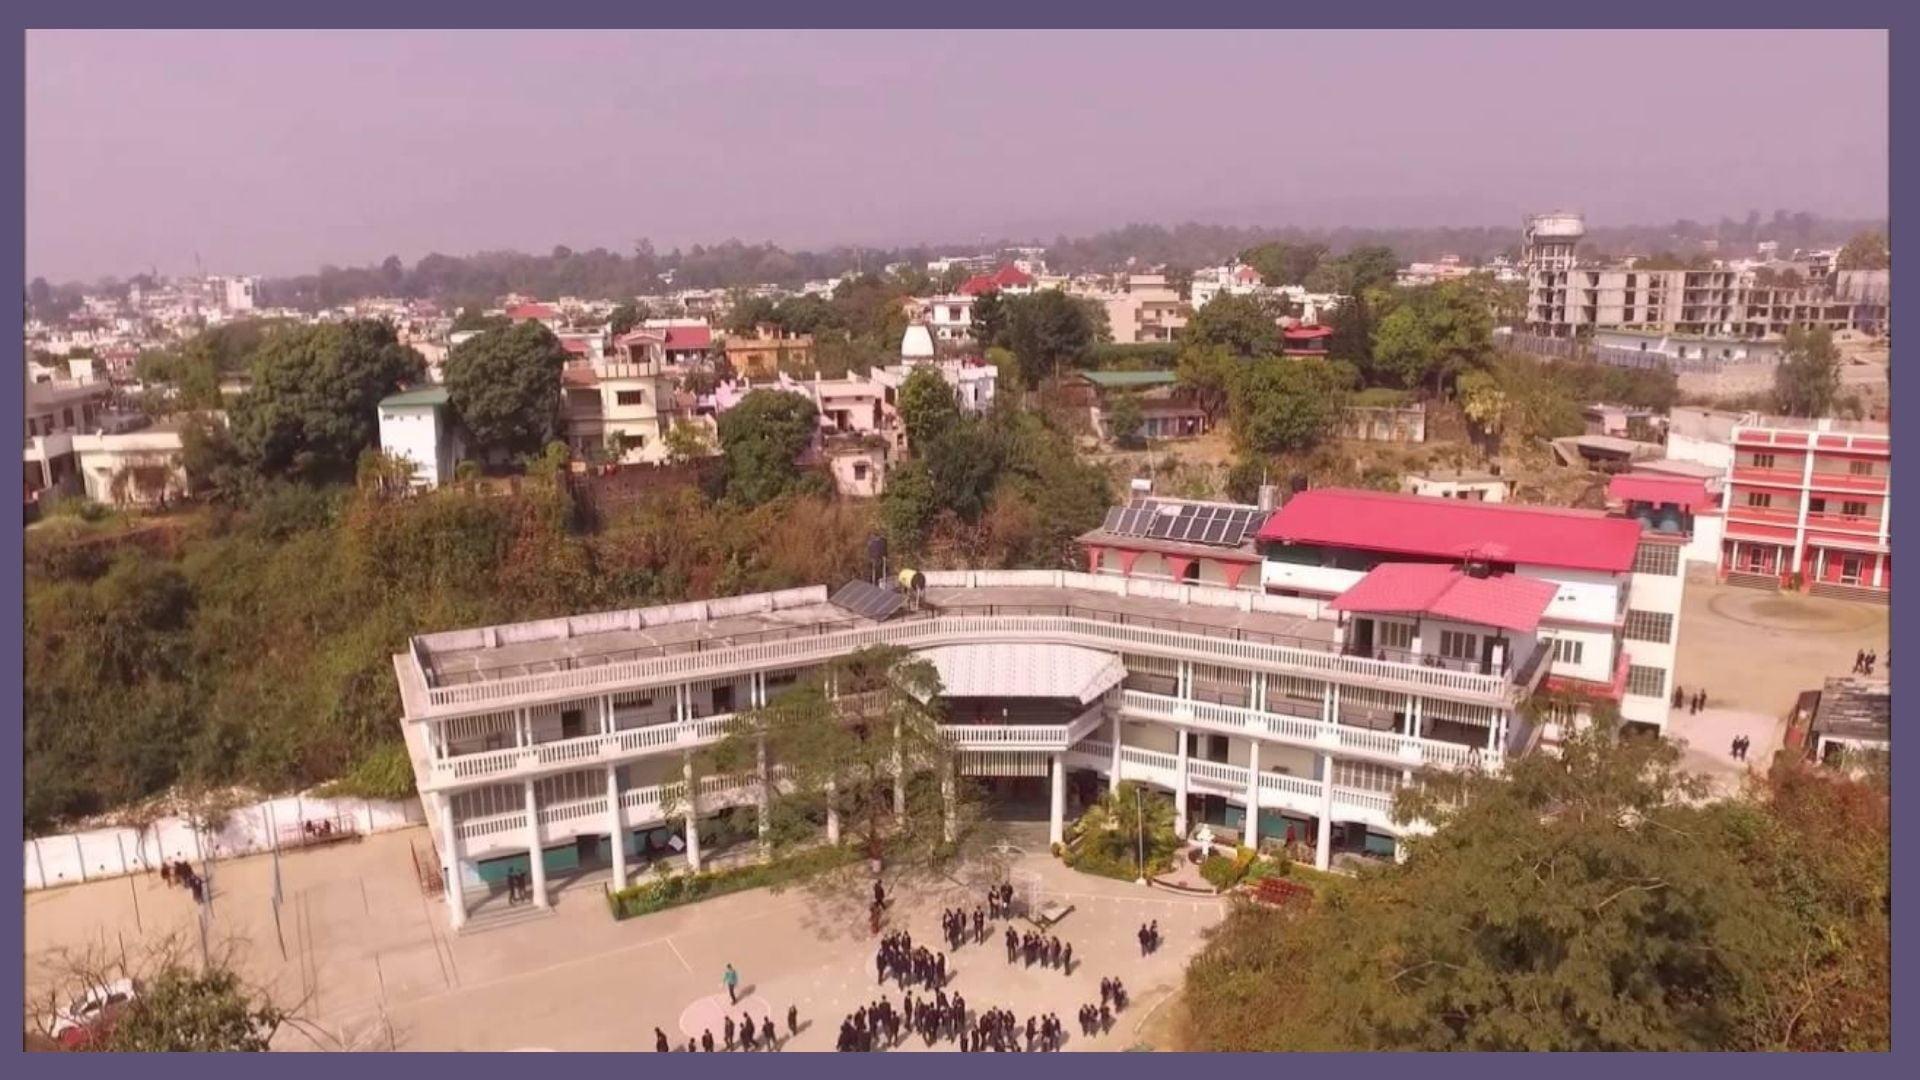 BEVERLY HILLS SHALINI SCHOOL